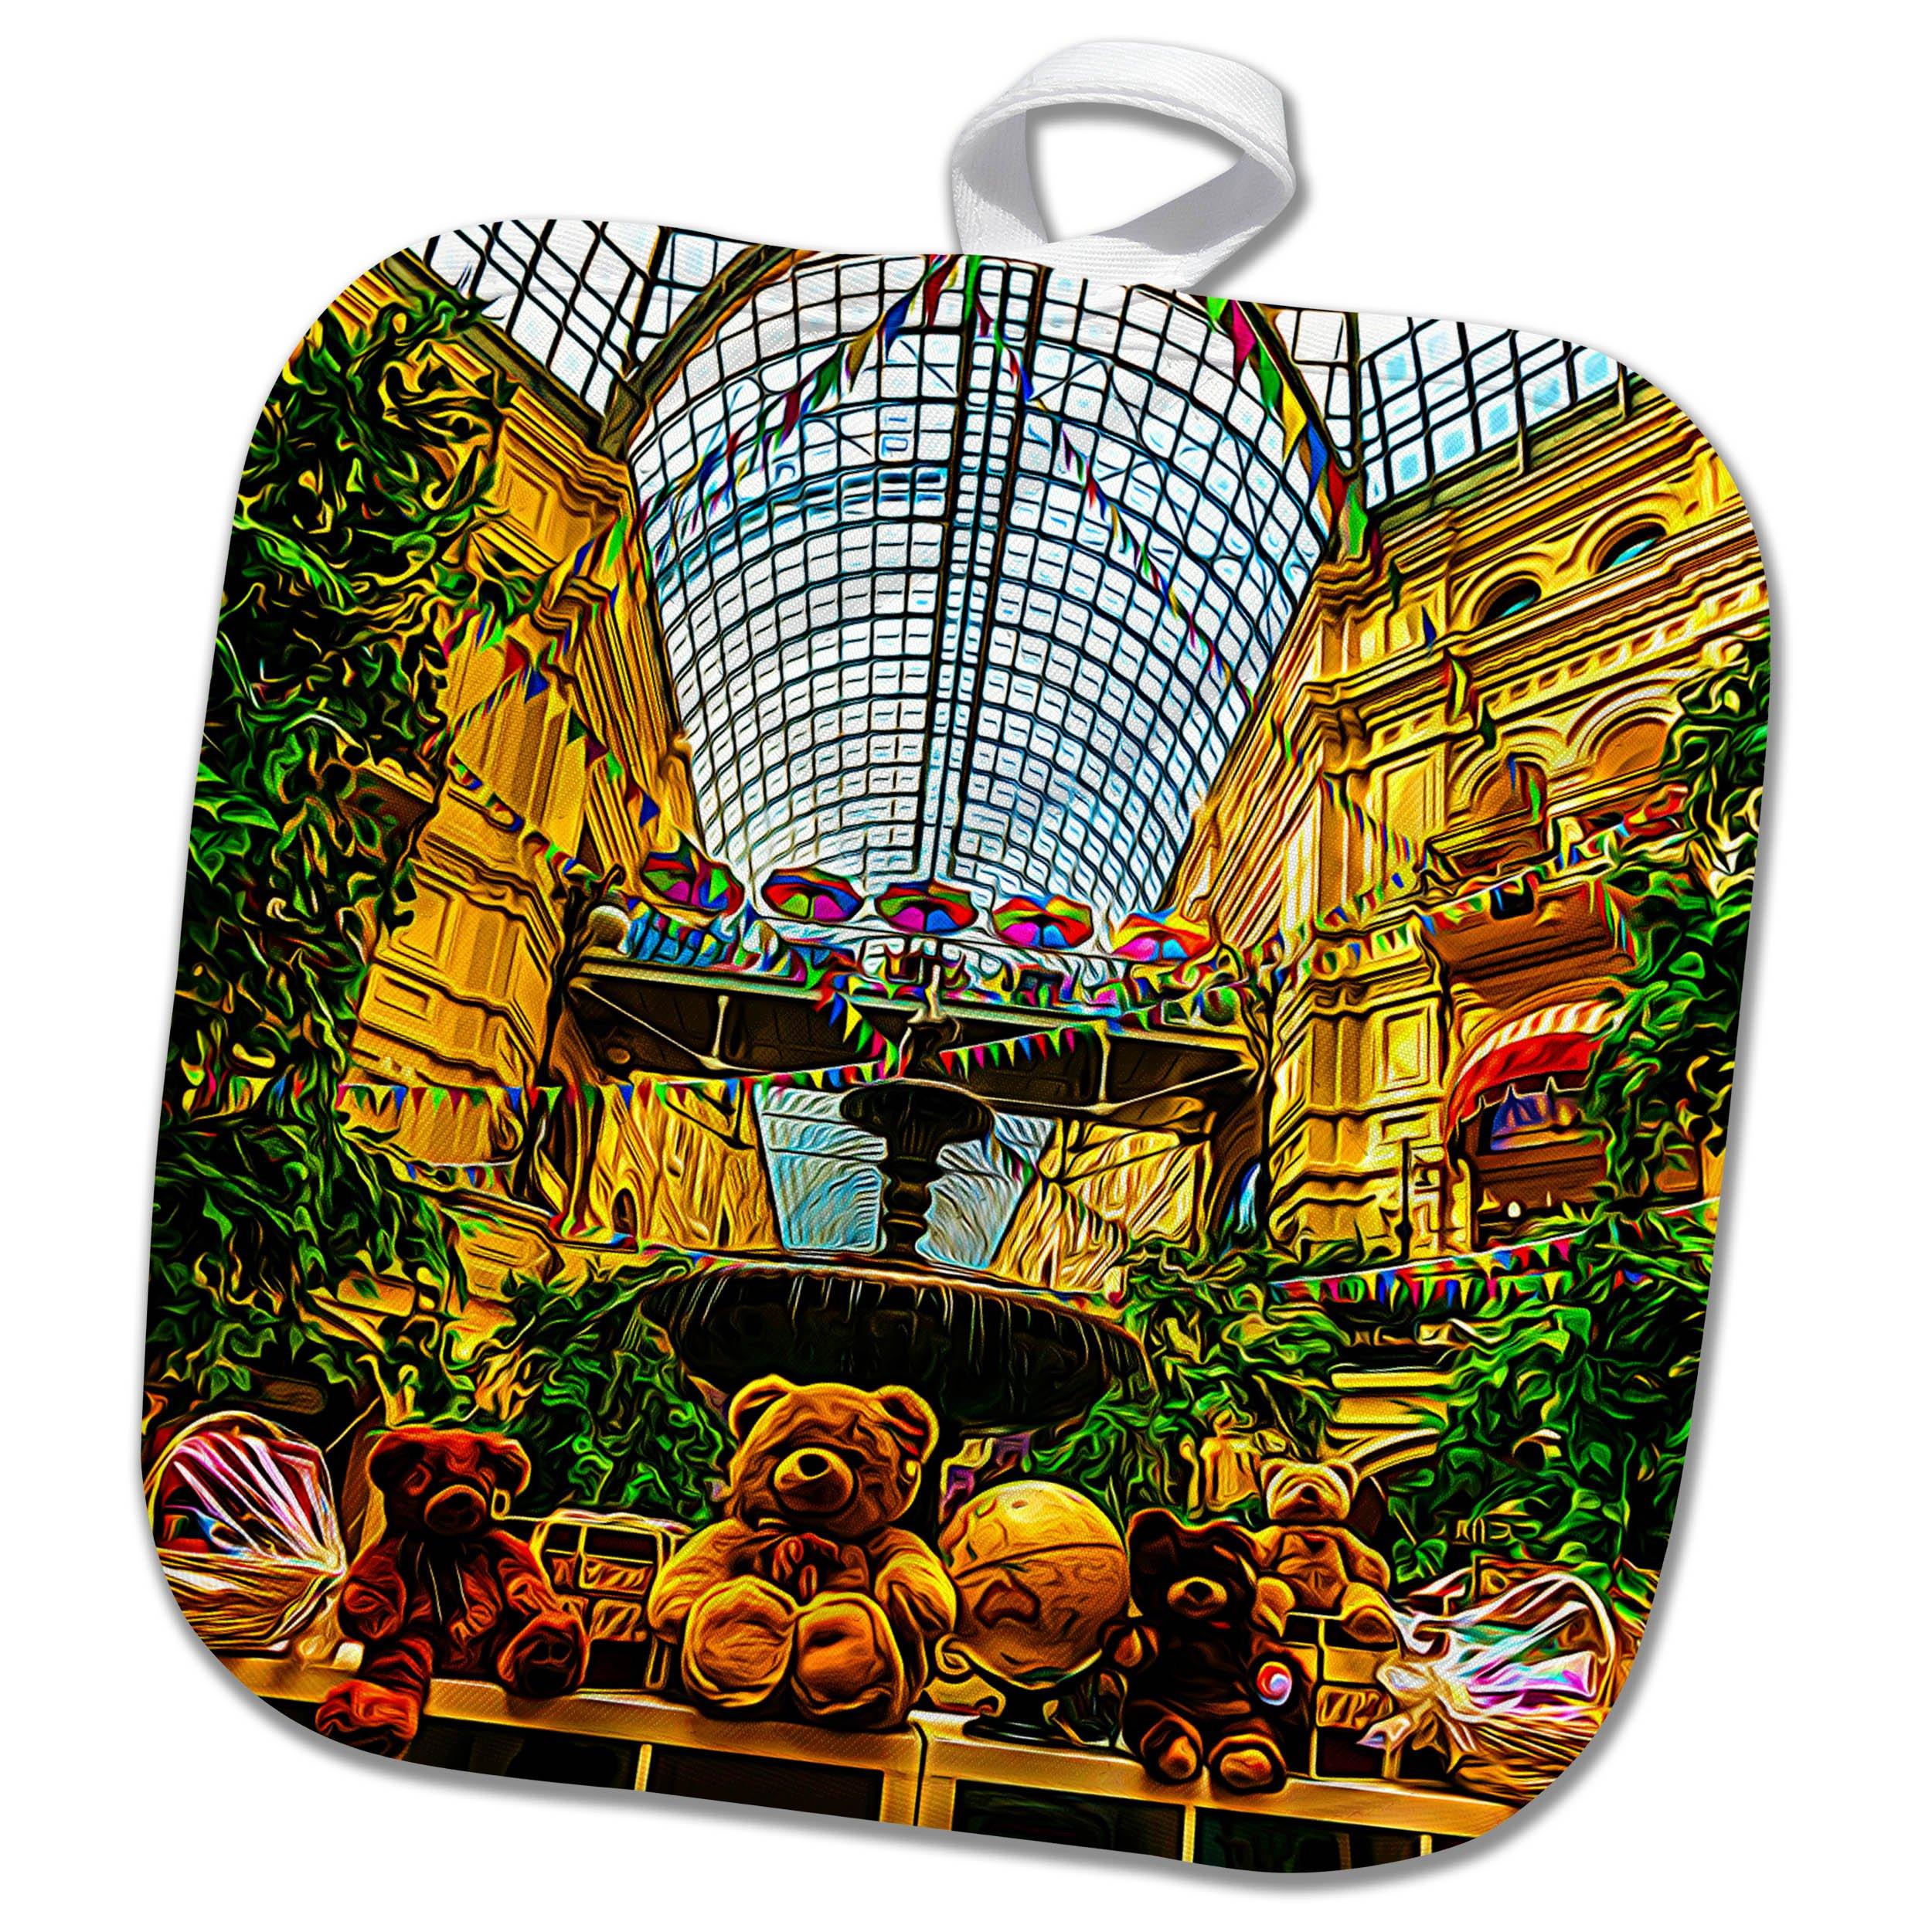 3dRose Alexis Photo-Art - Moscow City 2 - Moscow city art. Shoppers paradise - 8x8 Potholder (phl_273034_1)